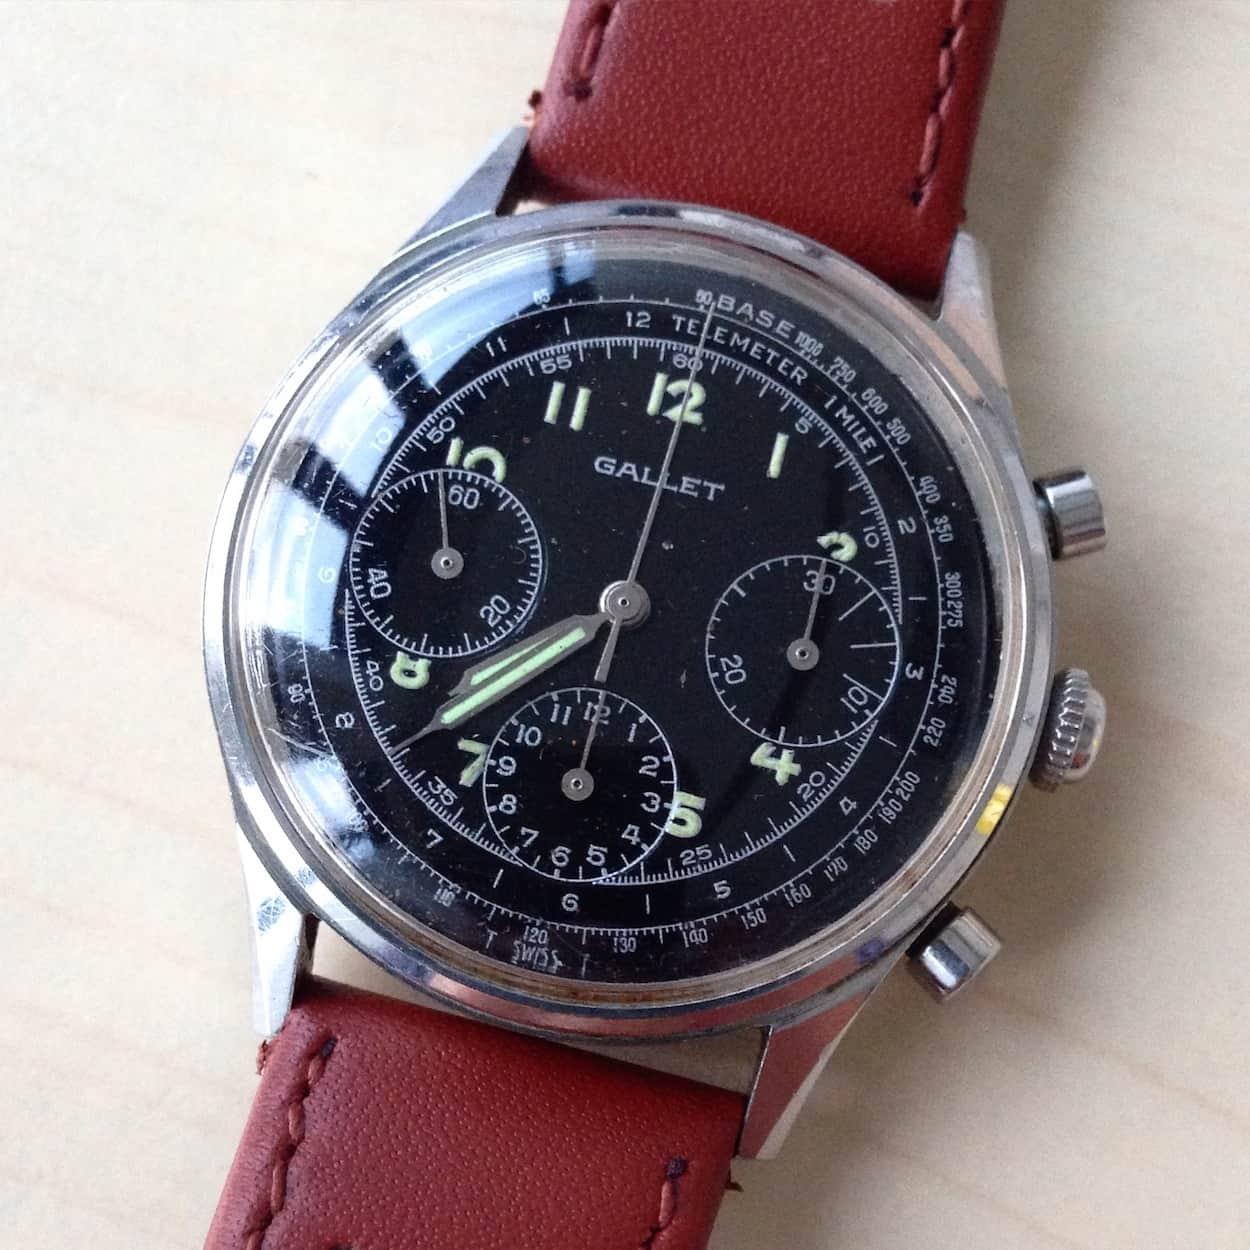 Gallet Chronograph